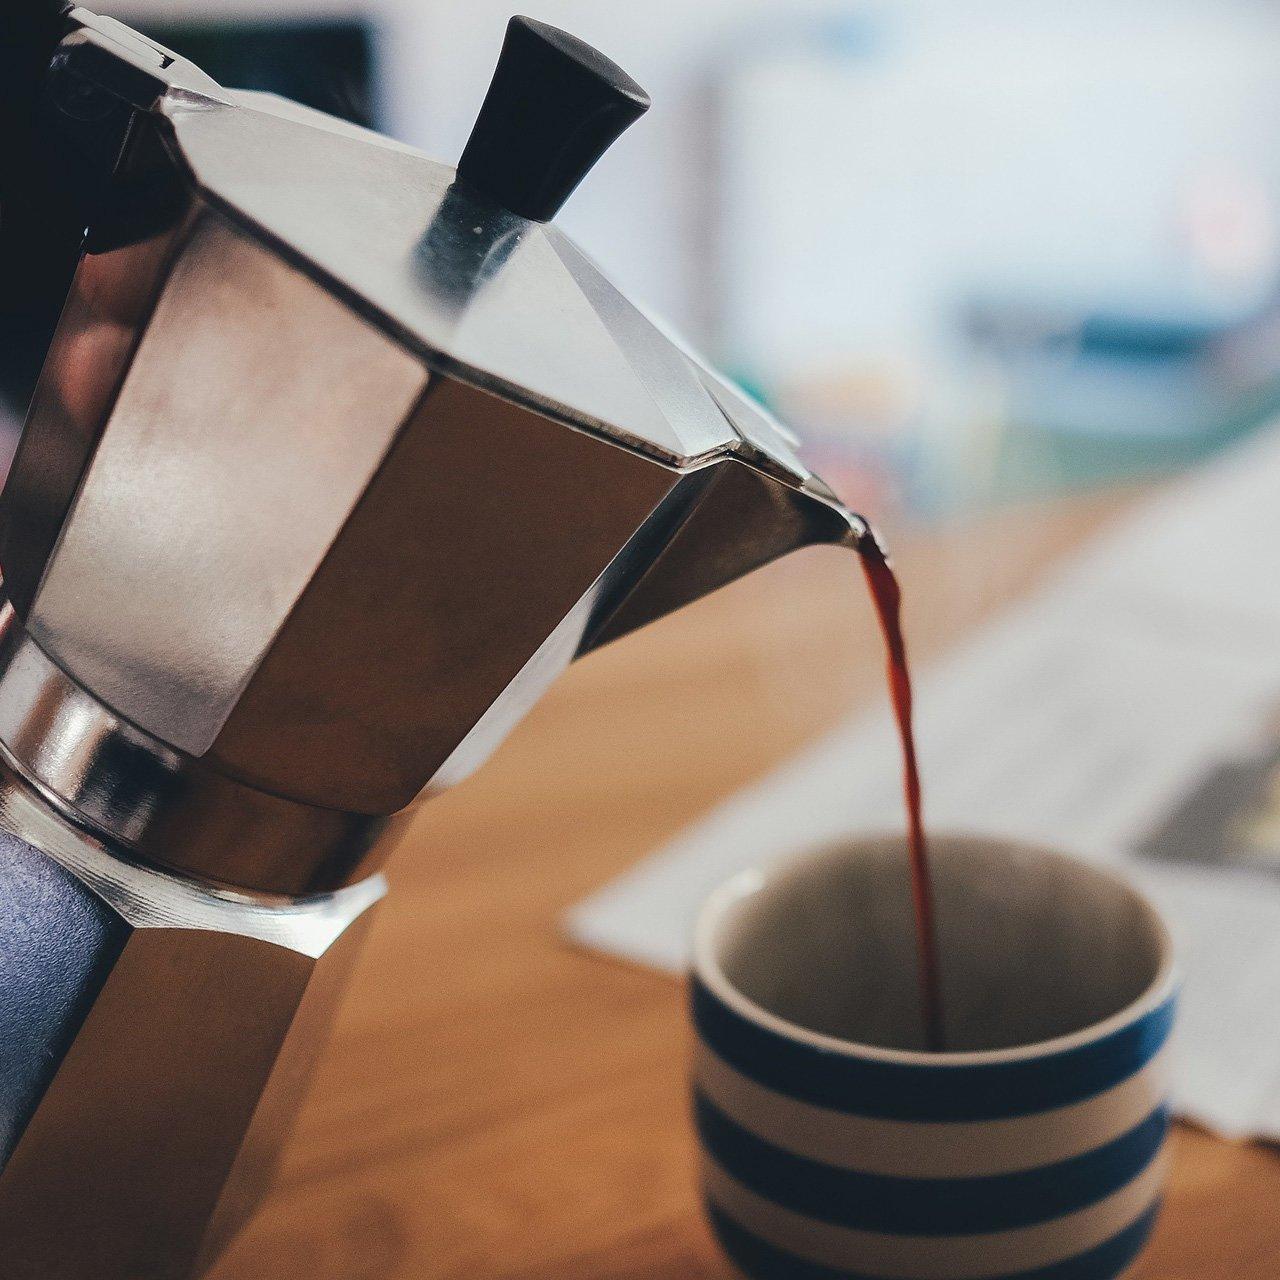 Kalorienarme Getränke-Alternative Ingwertee - auch als Kaffee-Ersatz